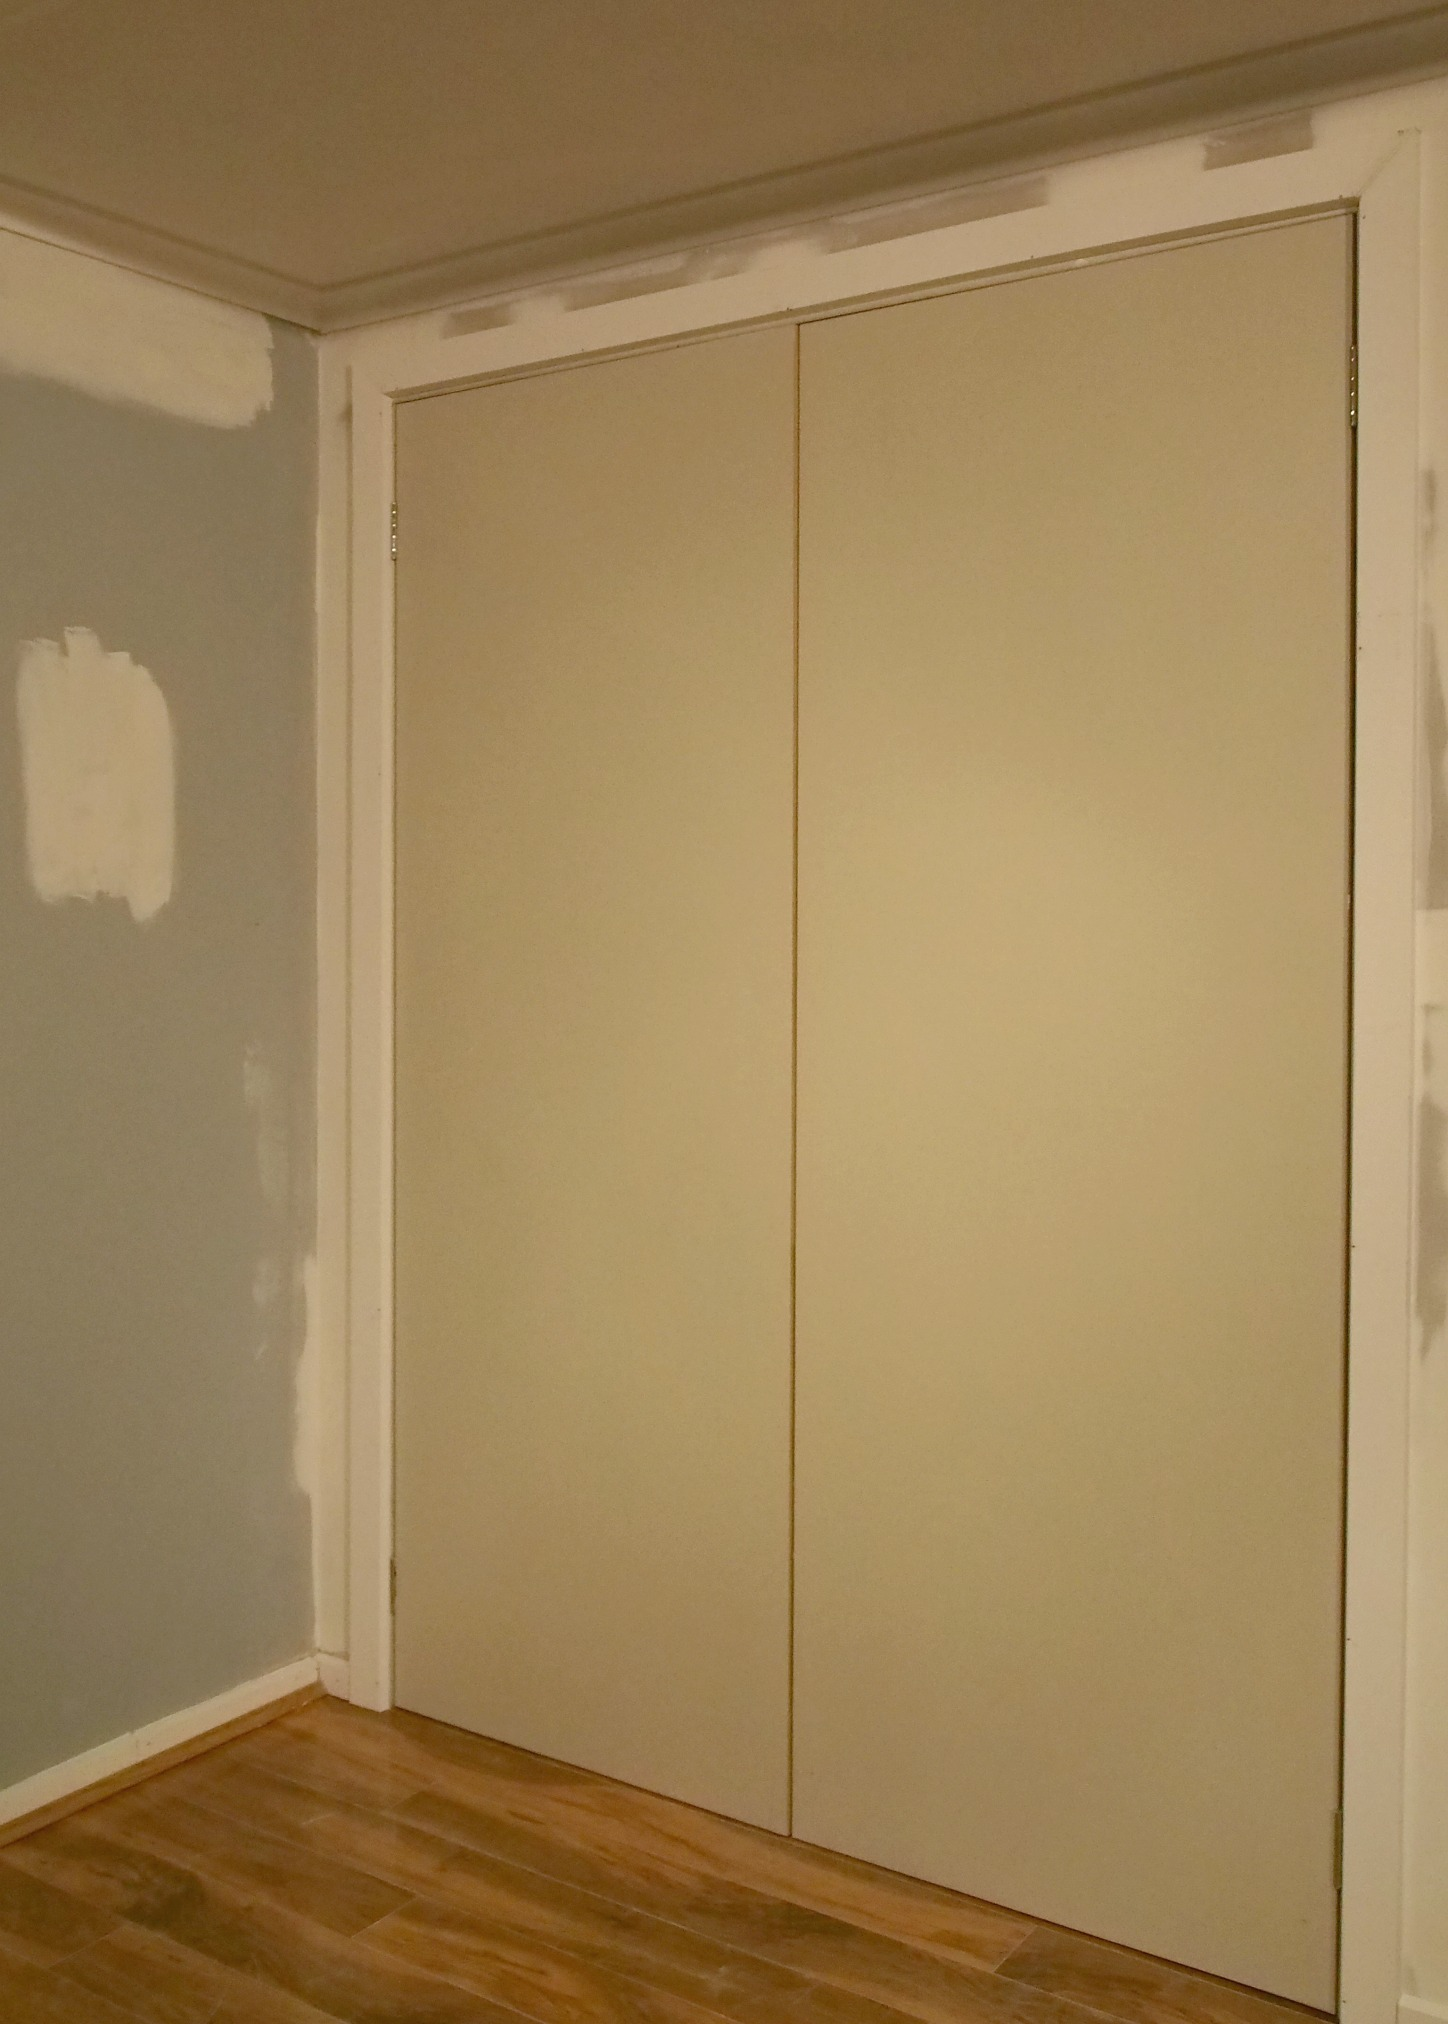 new cupboard build